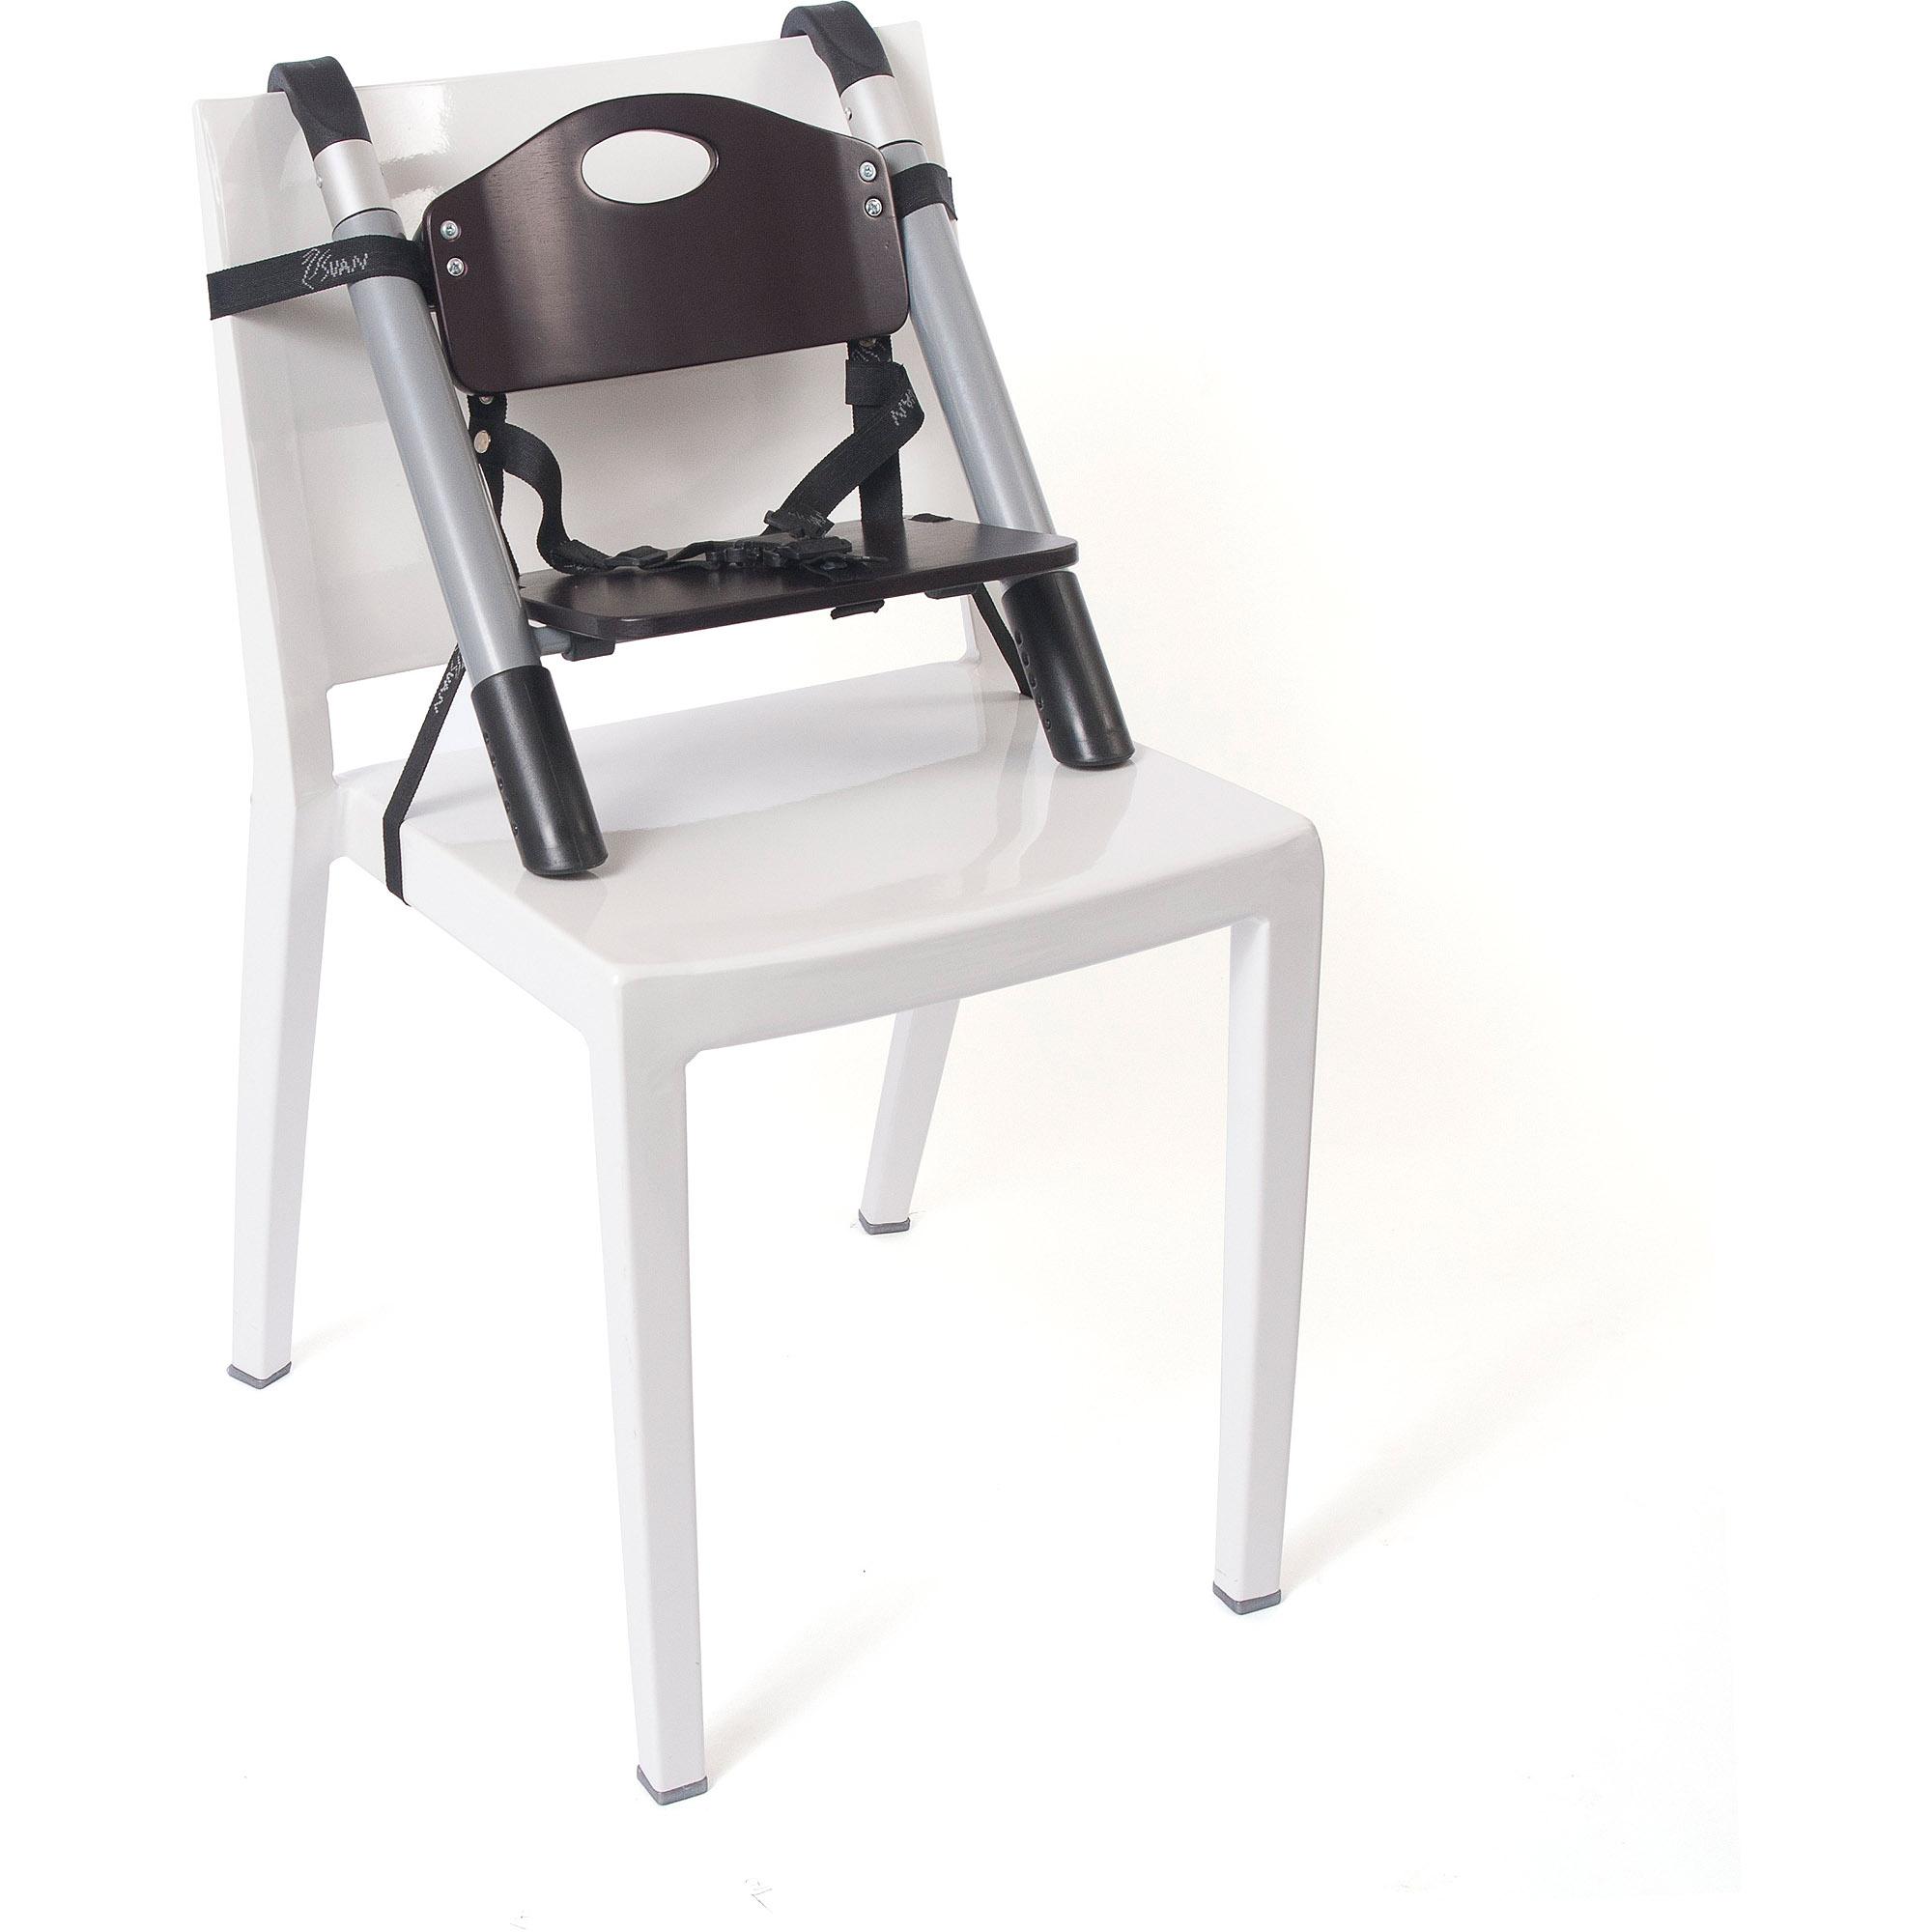 baby boppy chair recall cover hire gretna svan signet essential cherry walmart